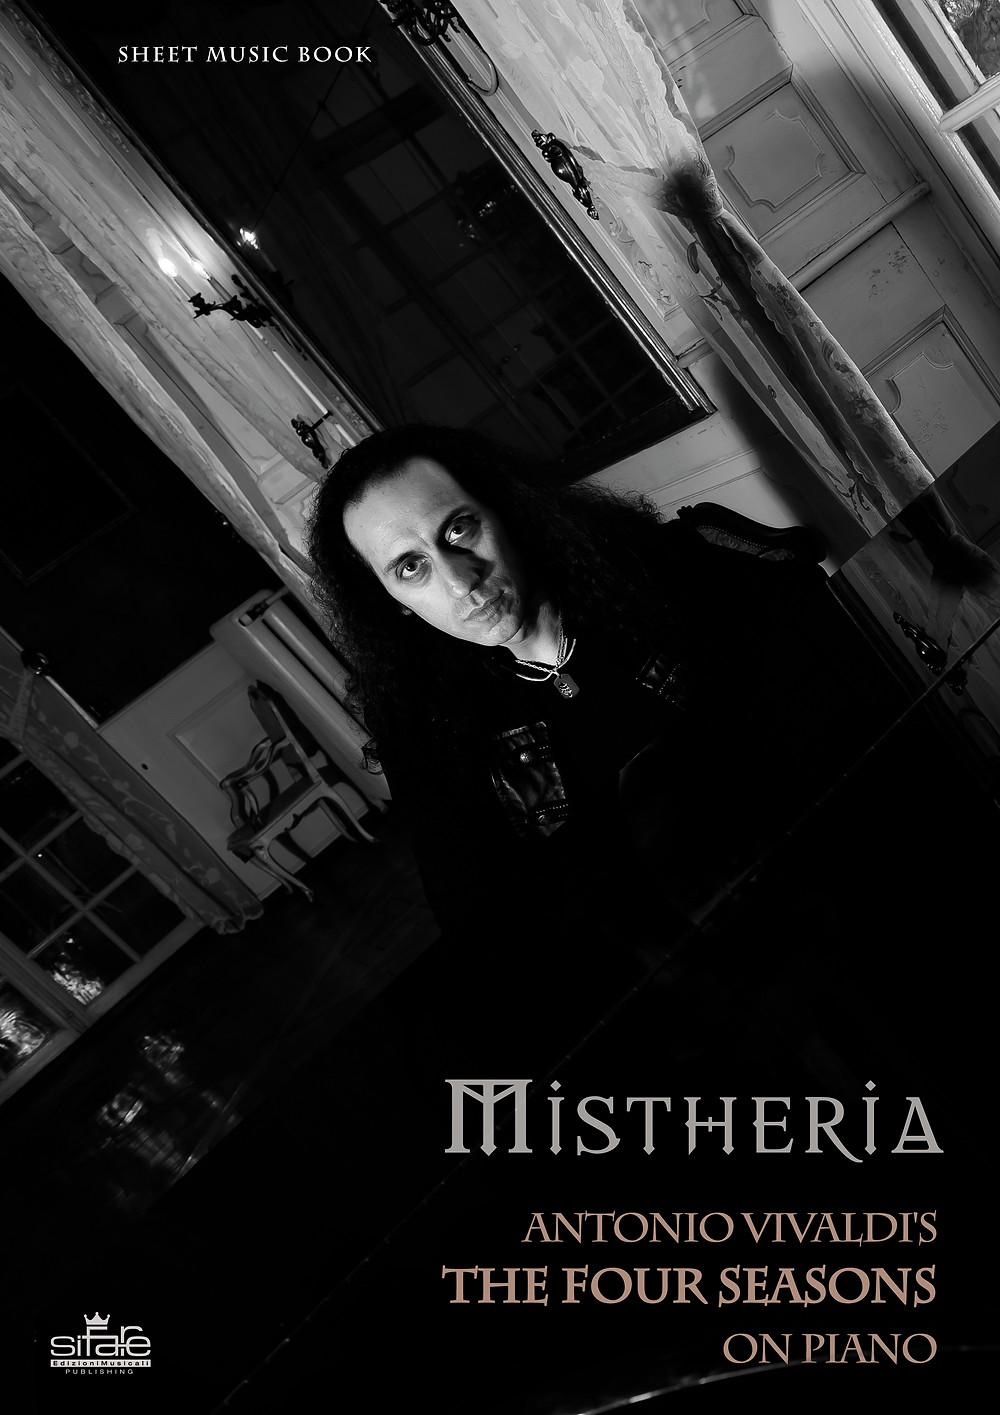 Mistheria plays Vivaldi's The Four Seasons on piano - Sheet music book